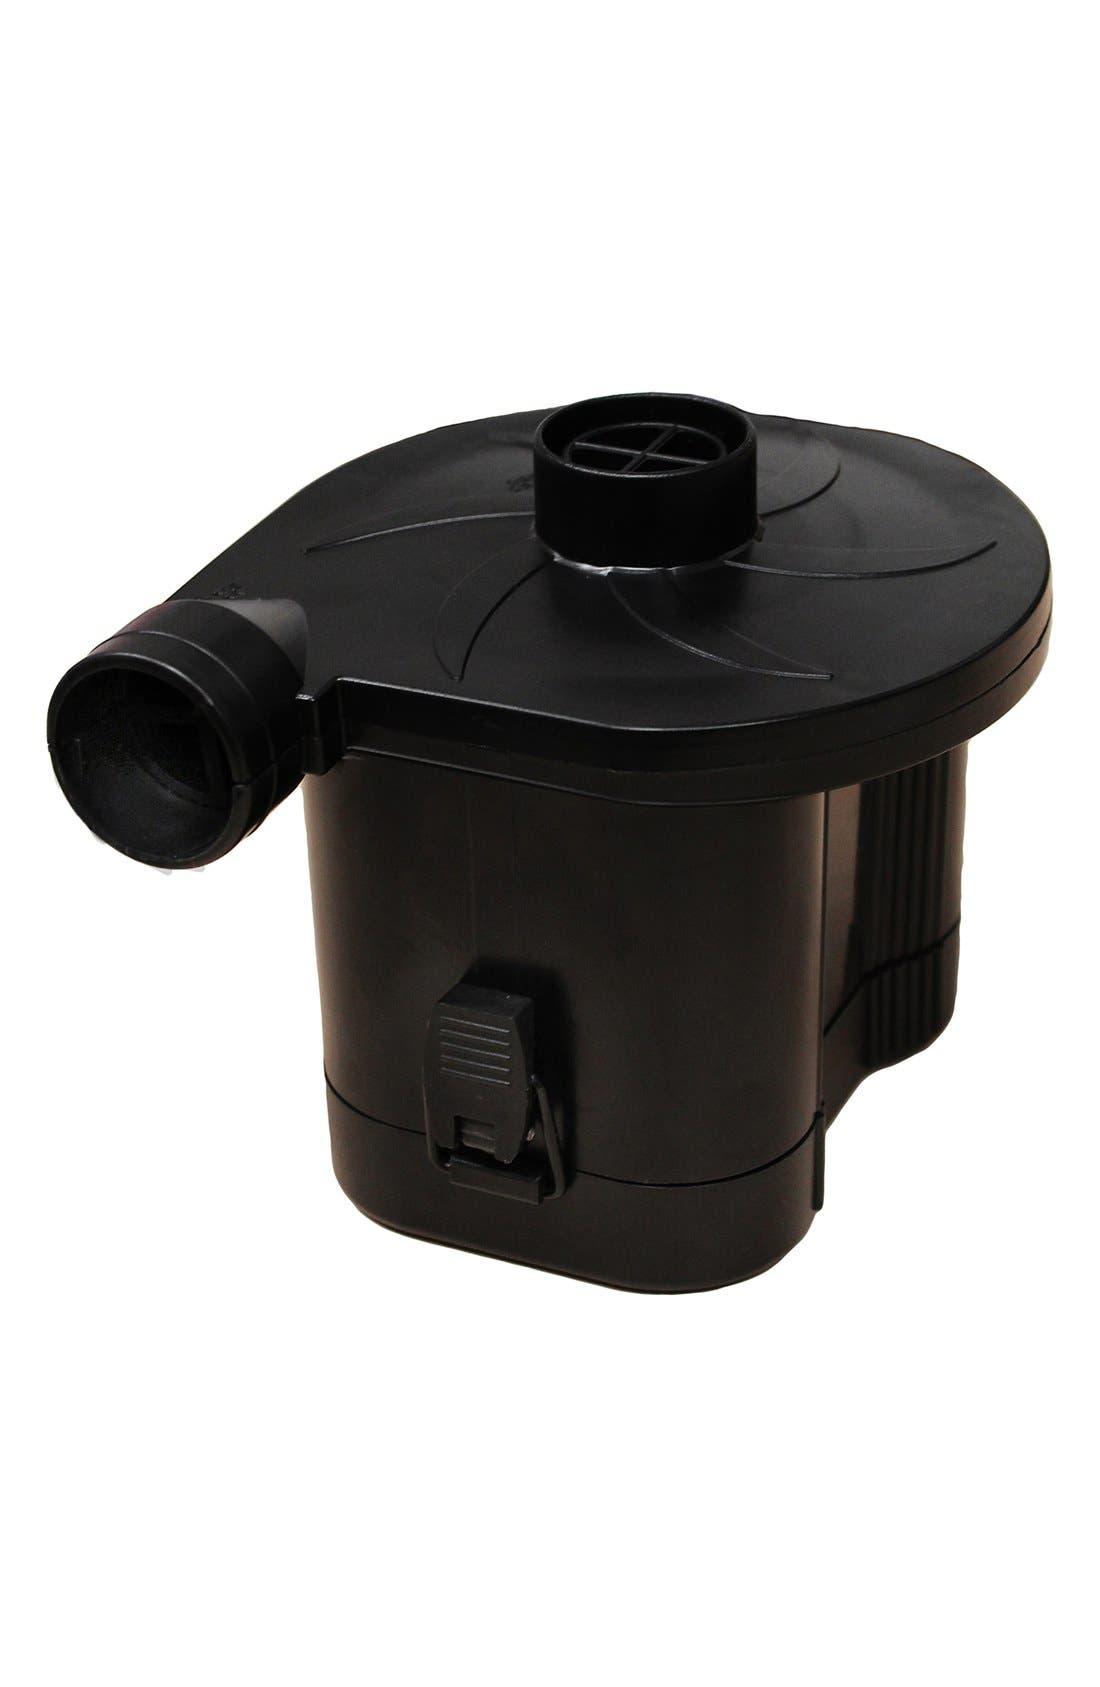 'Slackers' Electric Air Pump,                             Alternate thumbnail 2, color,                             No Color